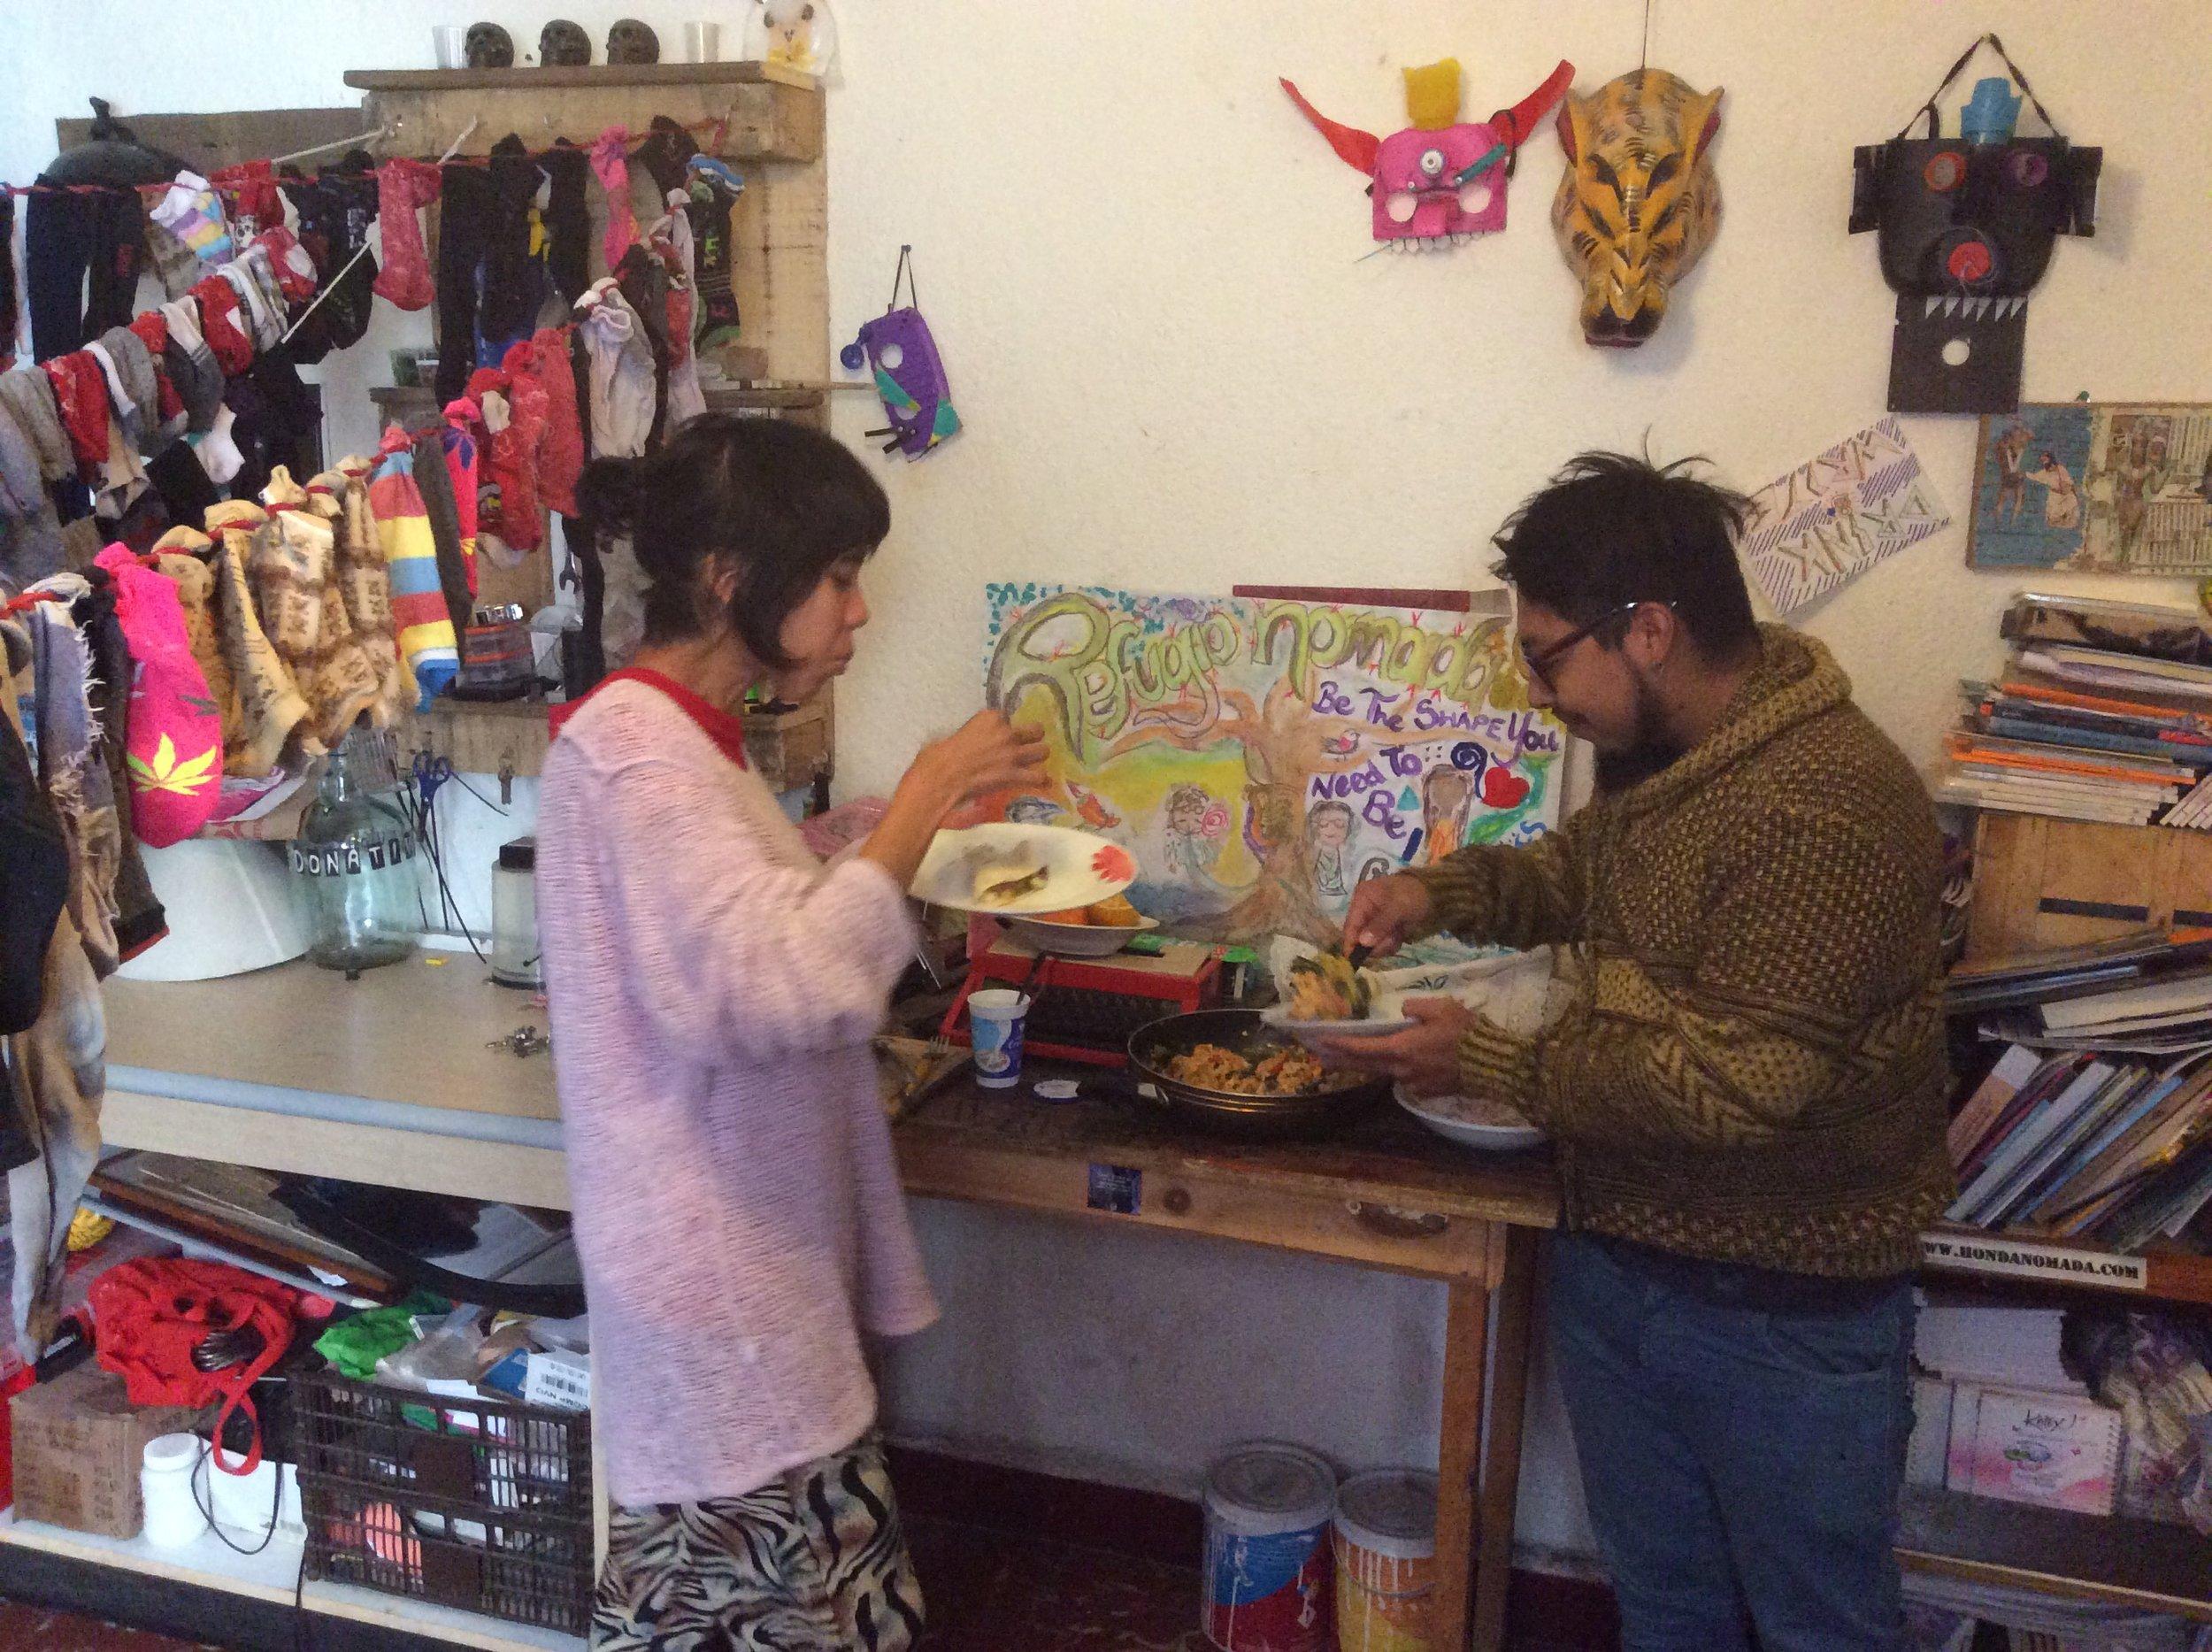 My leaving lunch - Cynthia Franco and Karloz Atl.